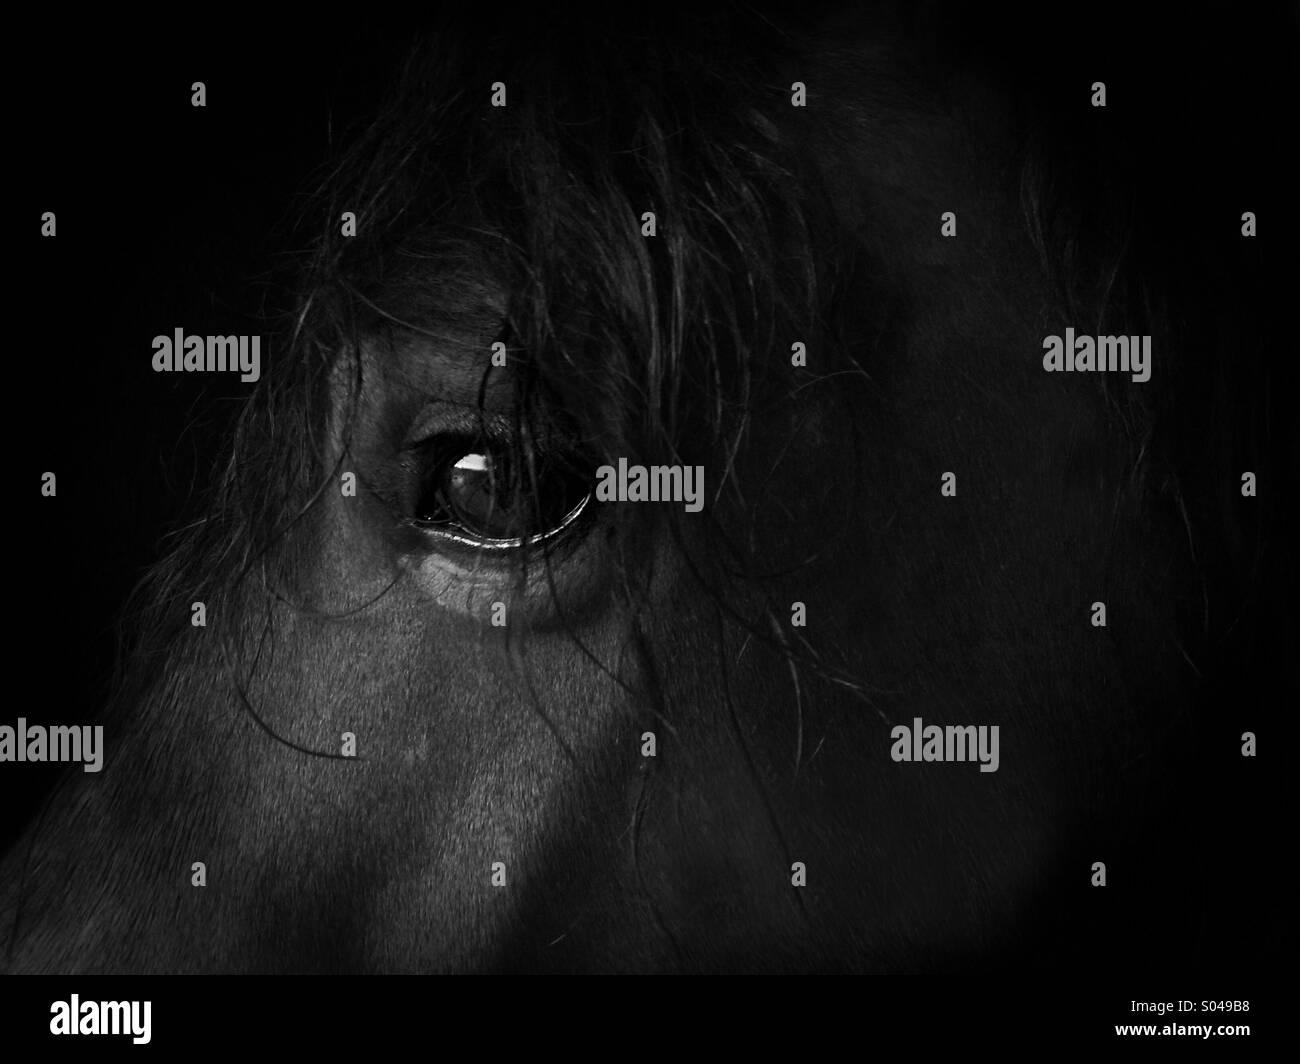 Intelligent eye of a horse - Stock Image